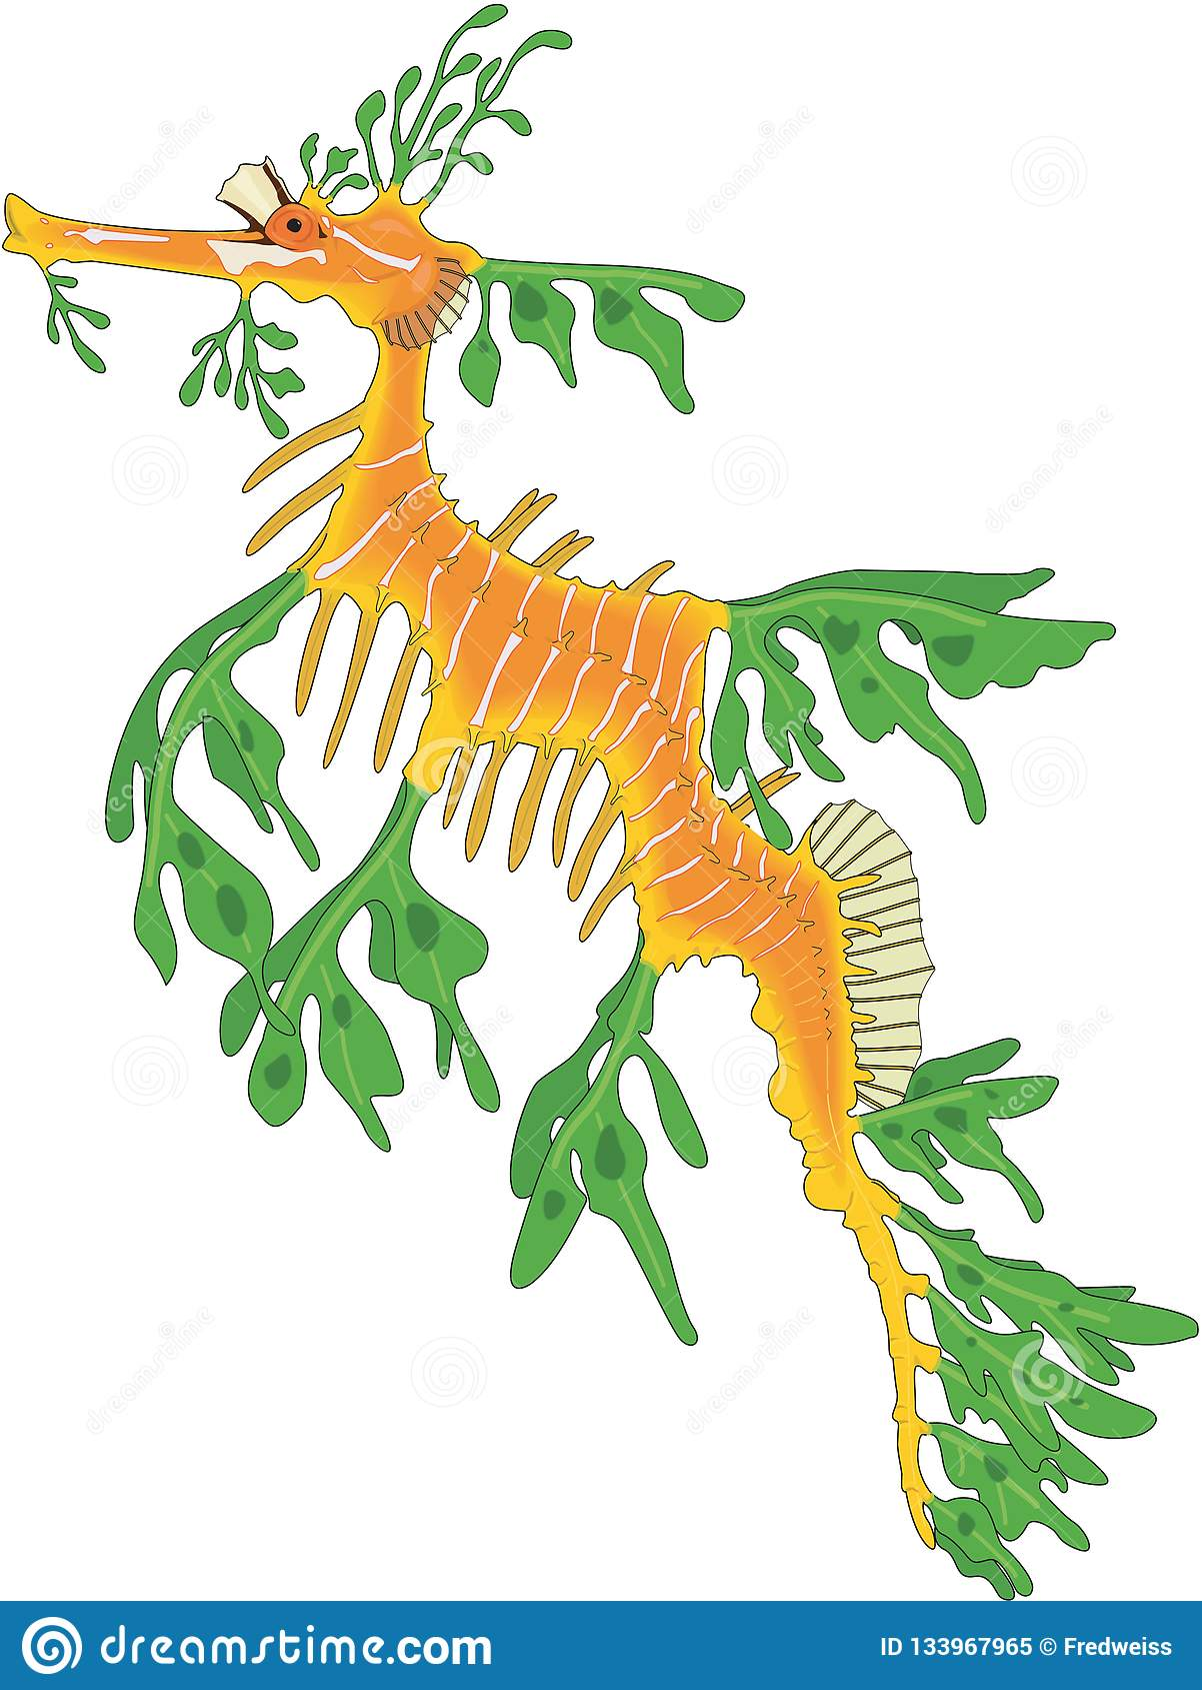 Sea Dragon Drawing : dragon, drawing, Leafy, Dragon, Stock, Illustrations, Illustrations,, Vectors, Clipart, Dreamstime